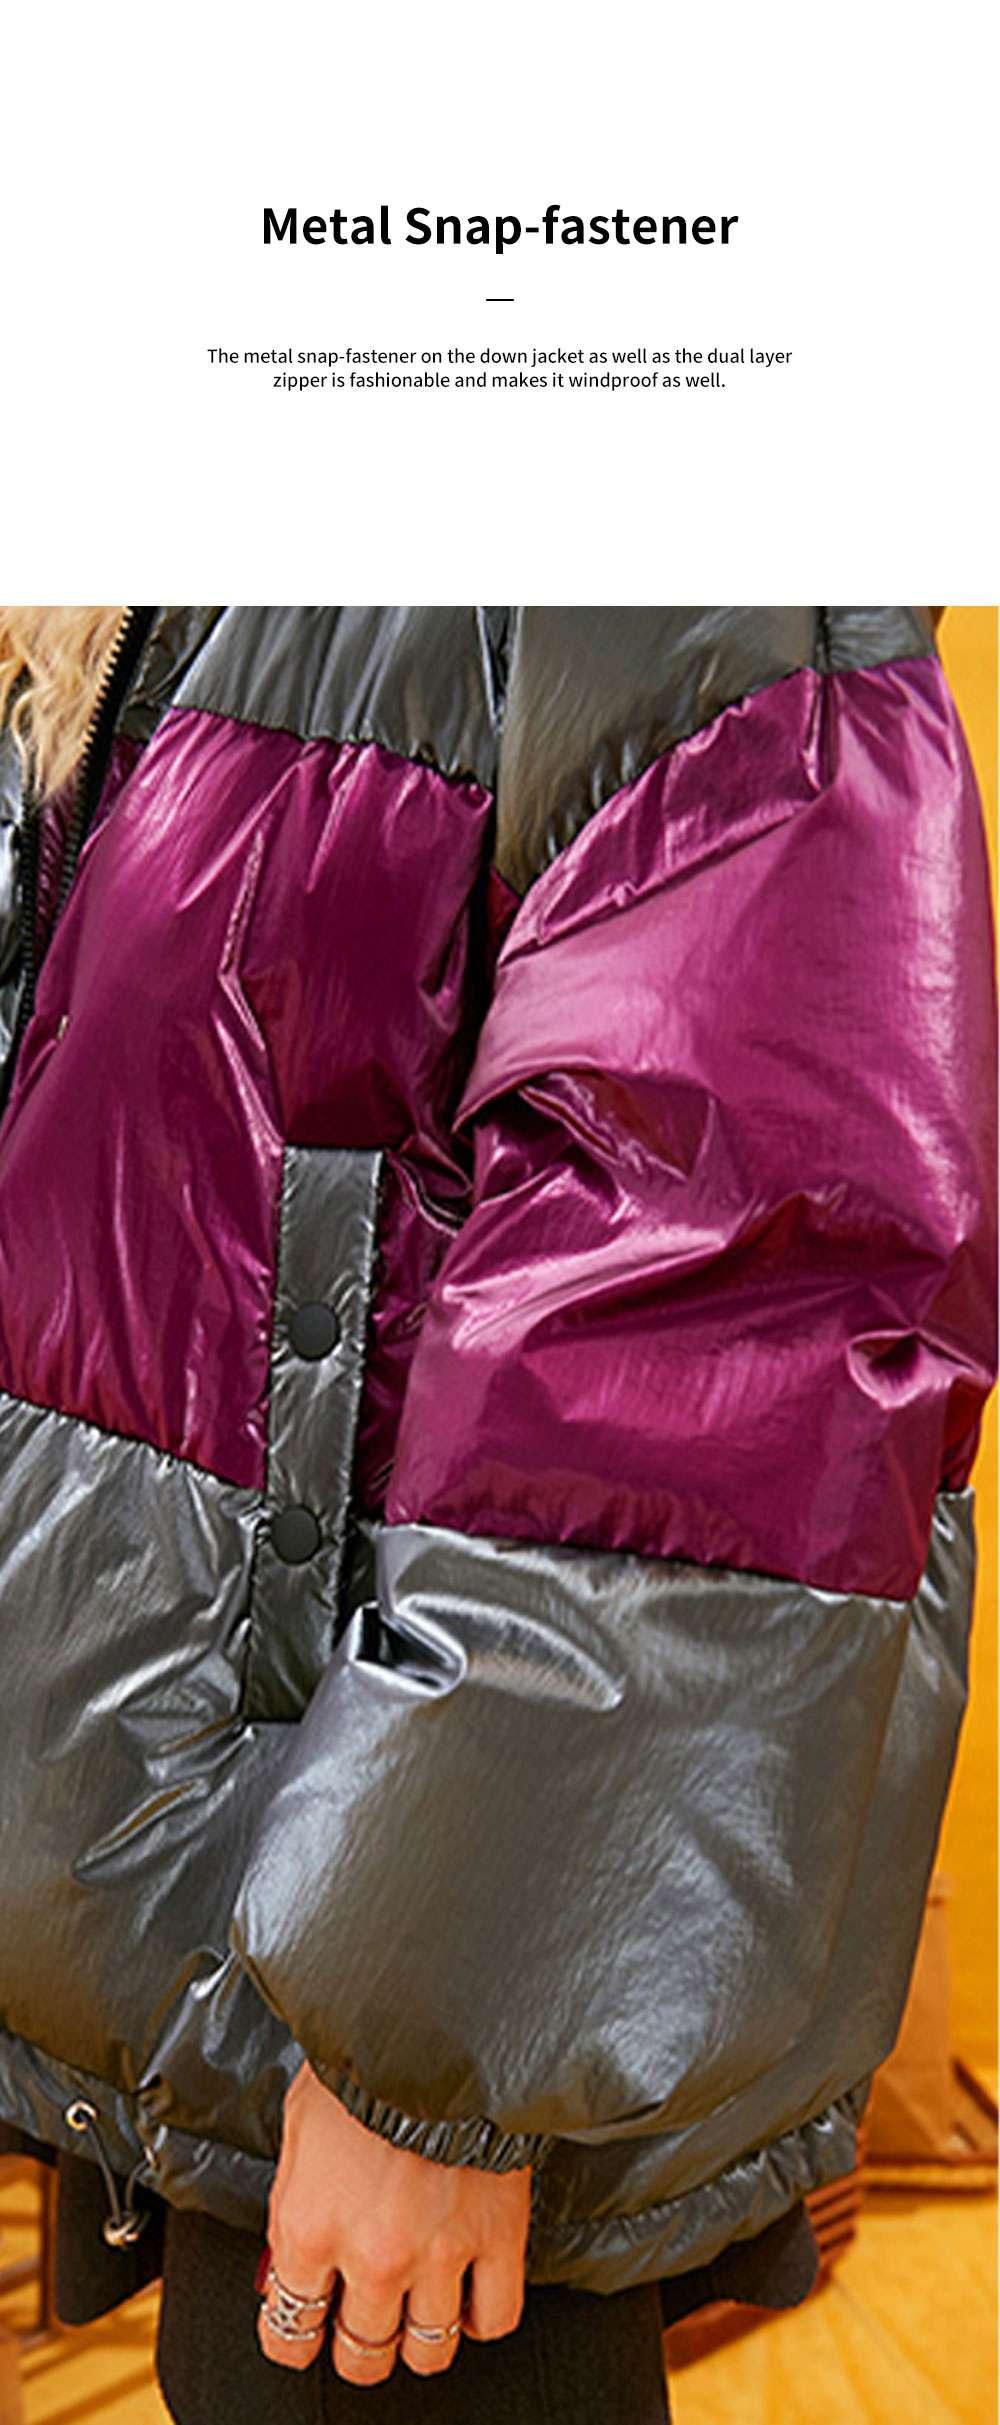 ELFSACK 2019 NEW Splicing Glossy Down Jacket for Women Winter Wear Loose Down Coat Fashion Down Jacket 5